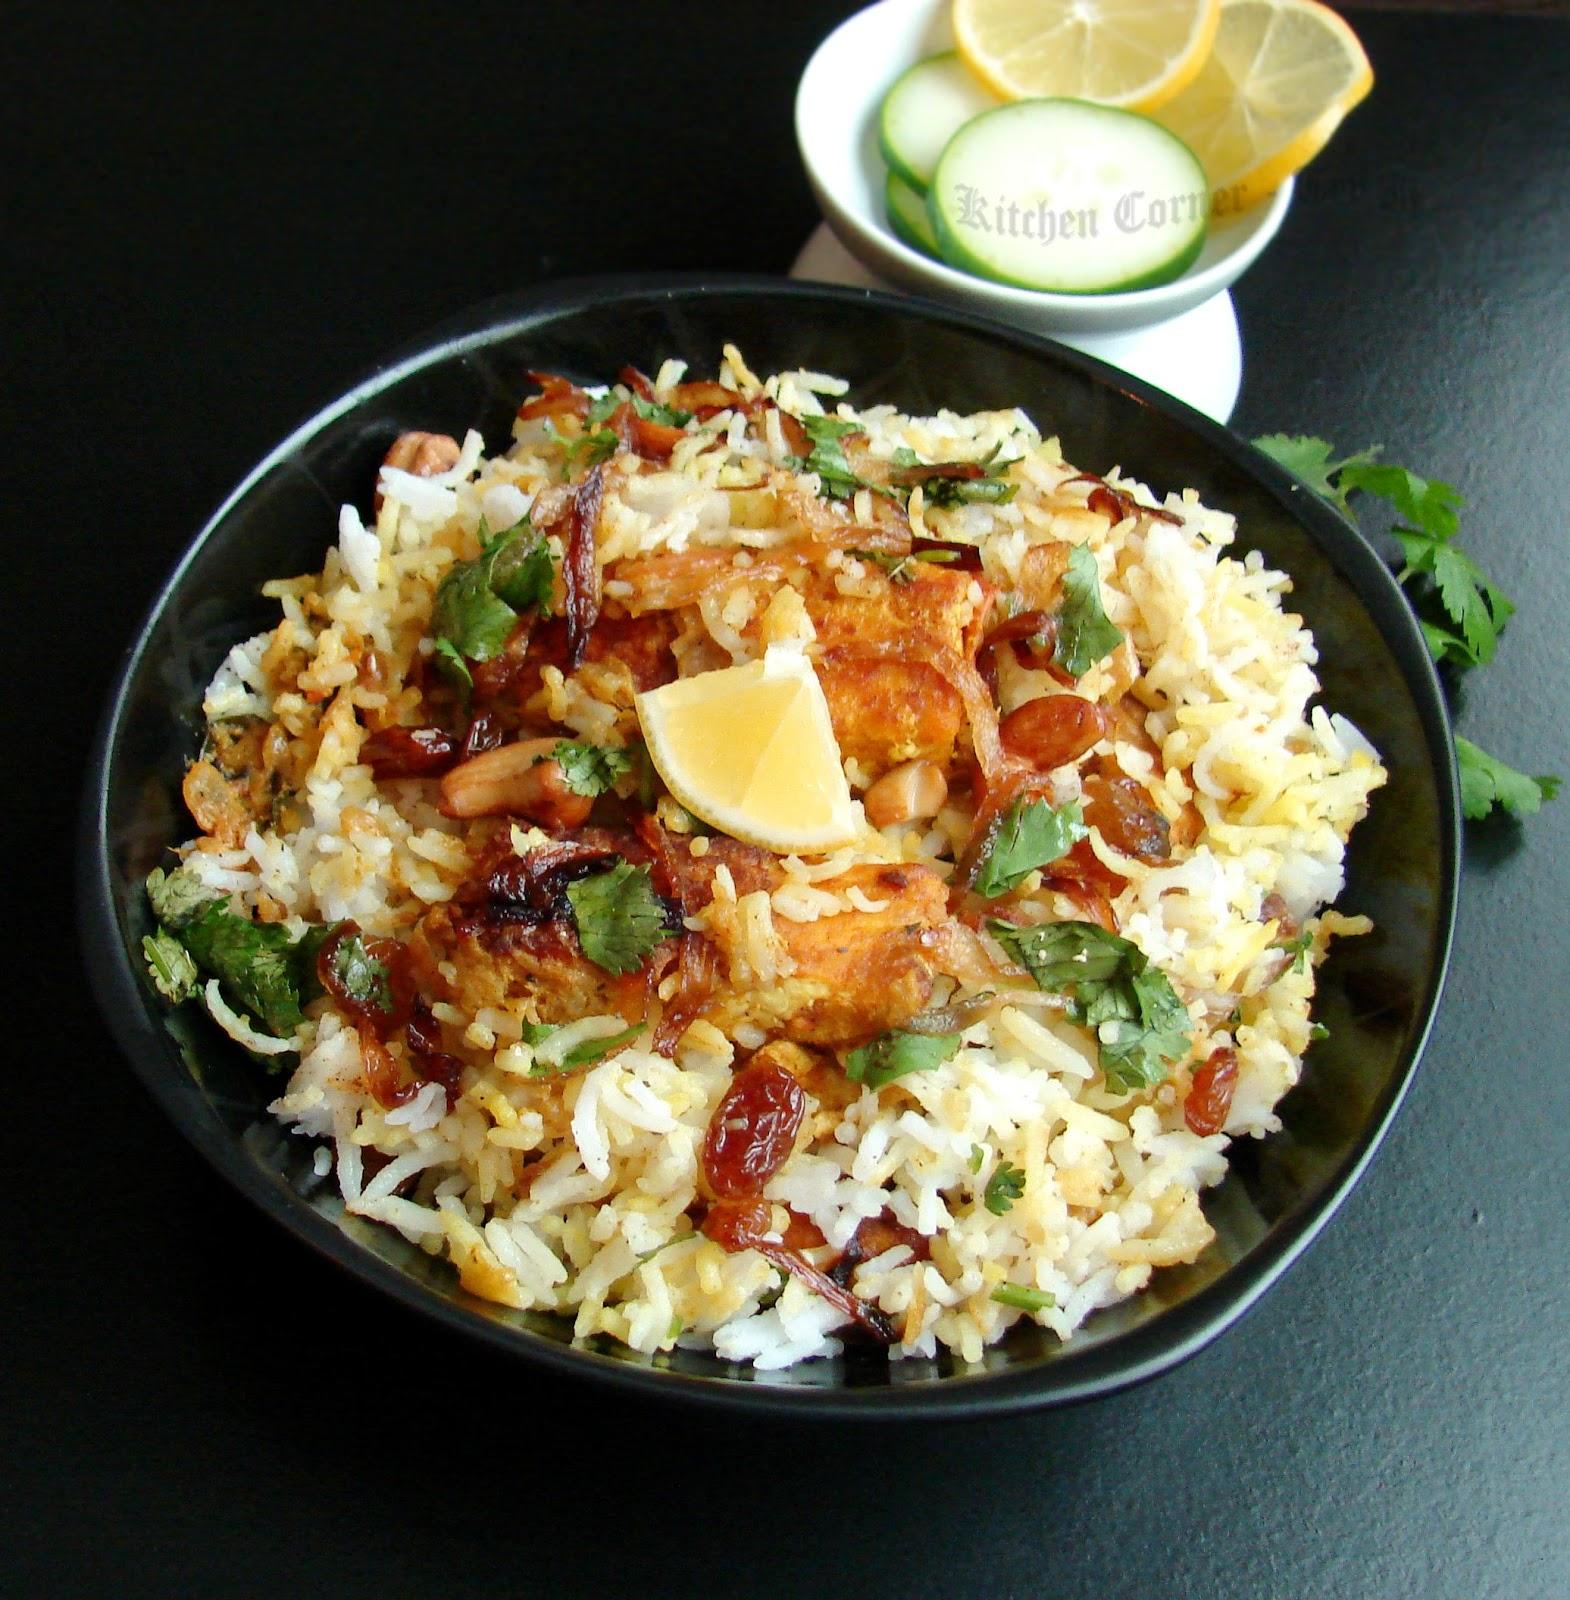 Kozhikodan recipes for salmon